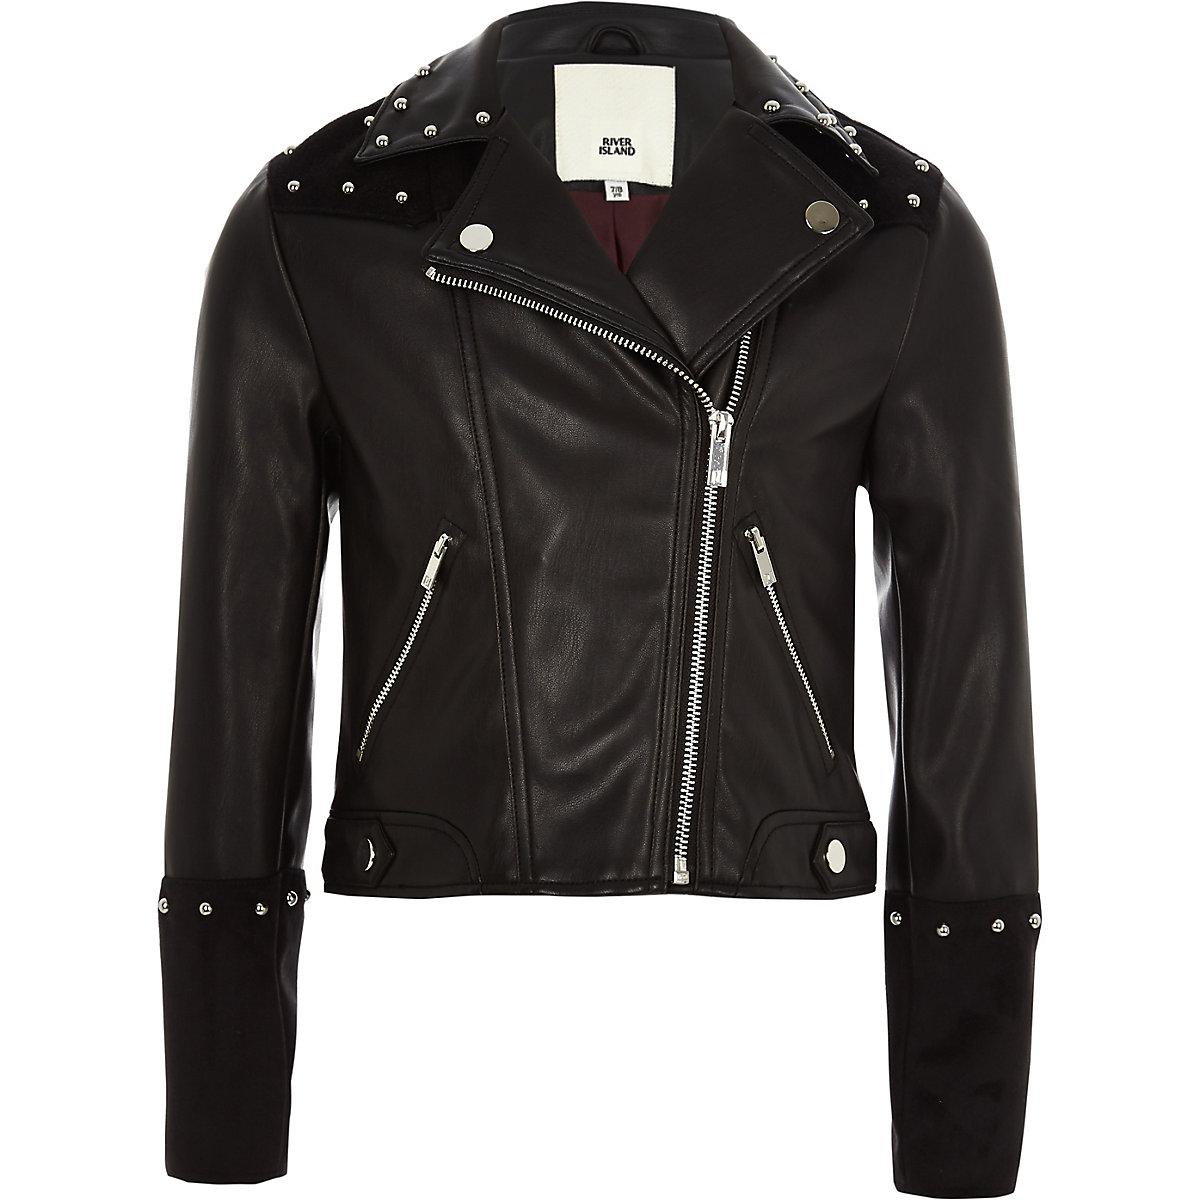 Girls black faux leather studded jacket